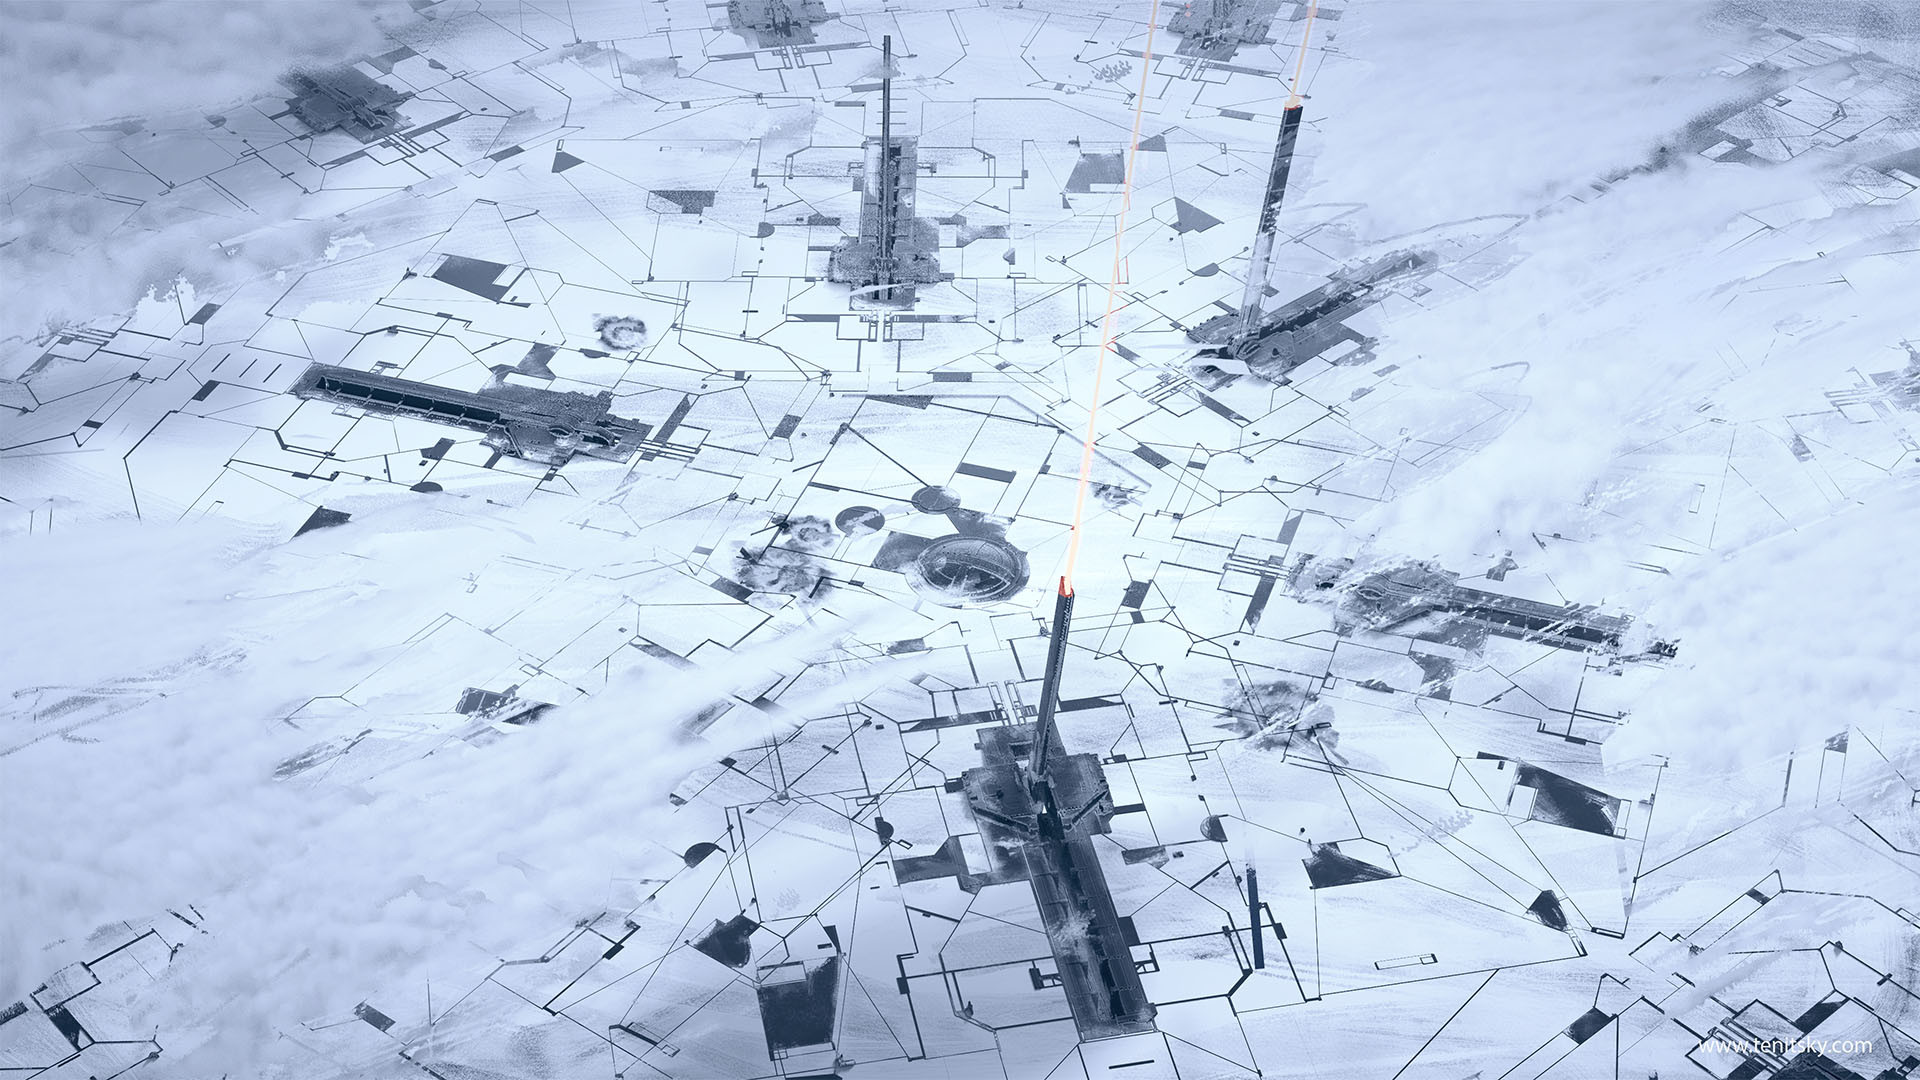 Anton t south pole defense array 001